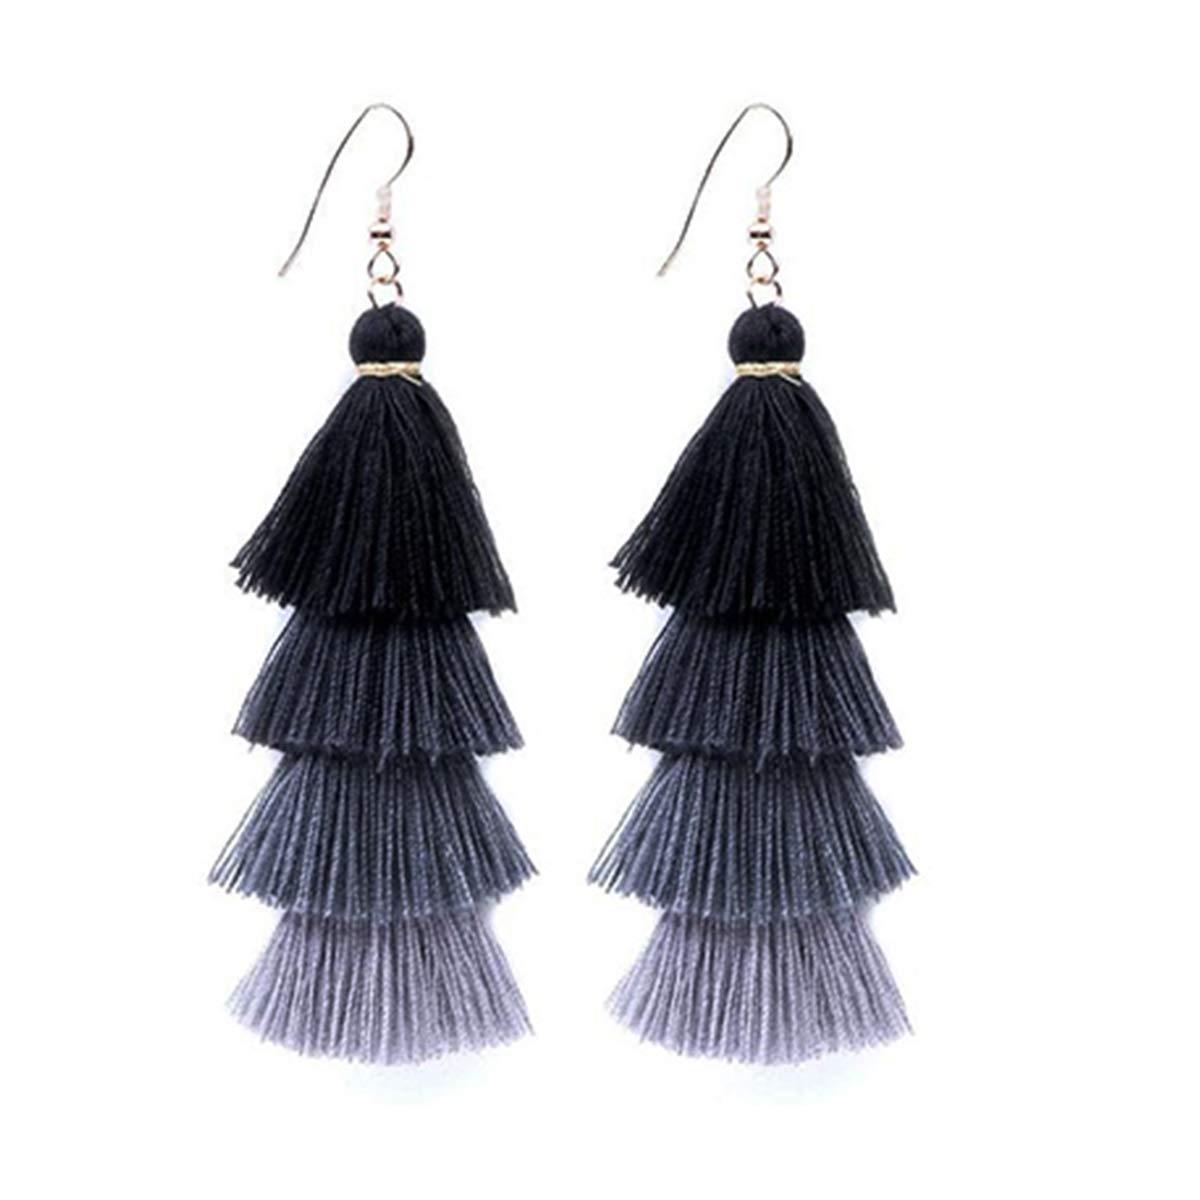 4 Layered Colorful Womens Stylish Earrings Bohemian Style Summer Tassel Drop Earrings (Black-4)